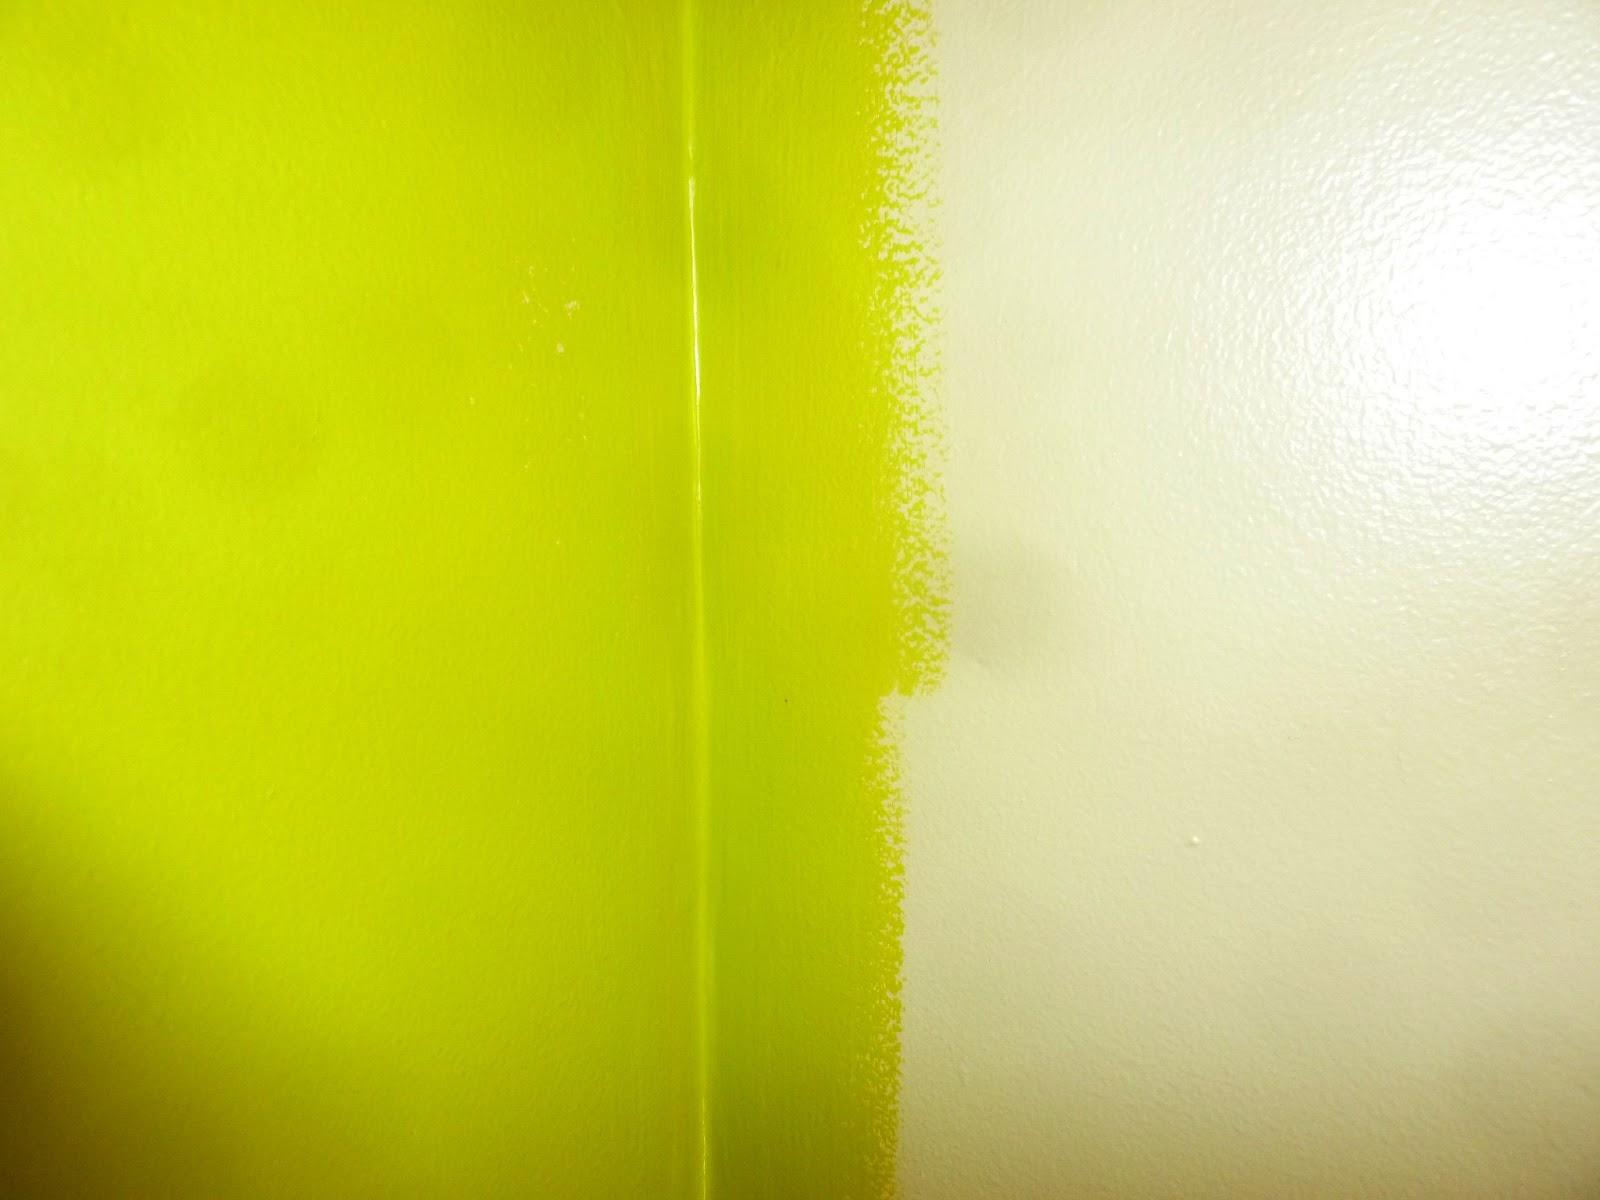 Happy Color the common milkweed: happy, happy color: sunroom